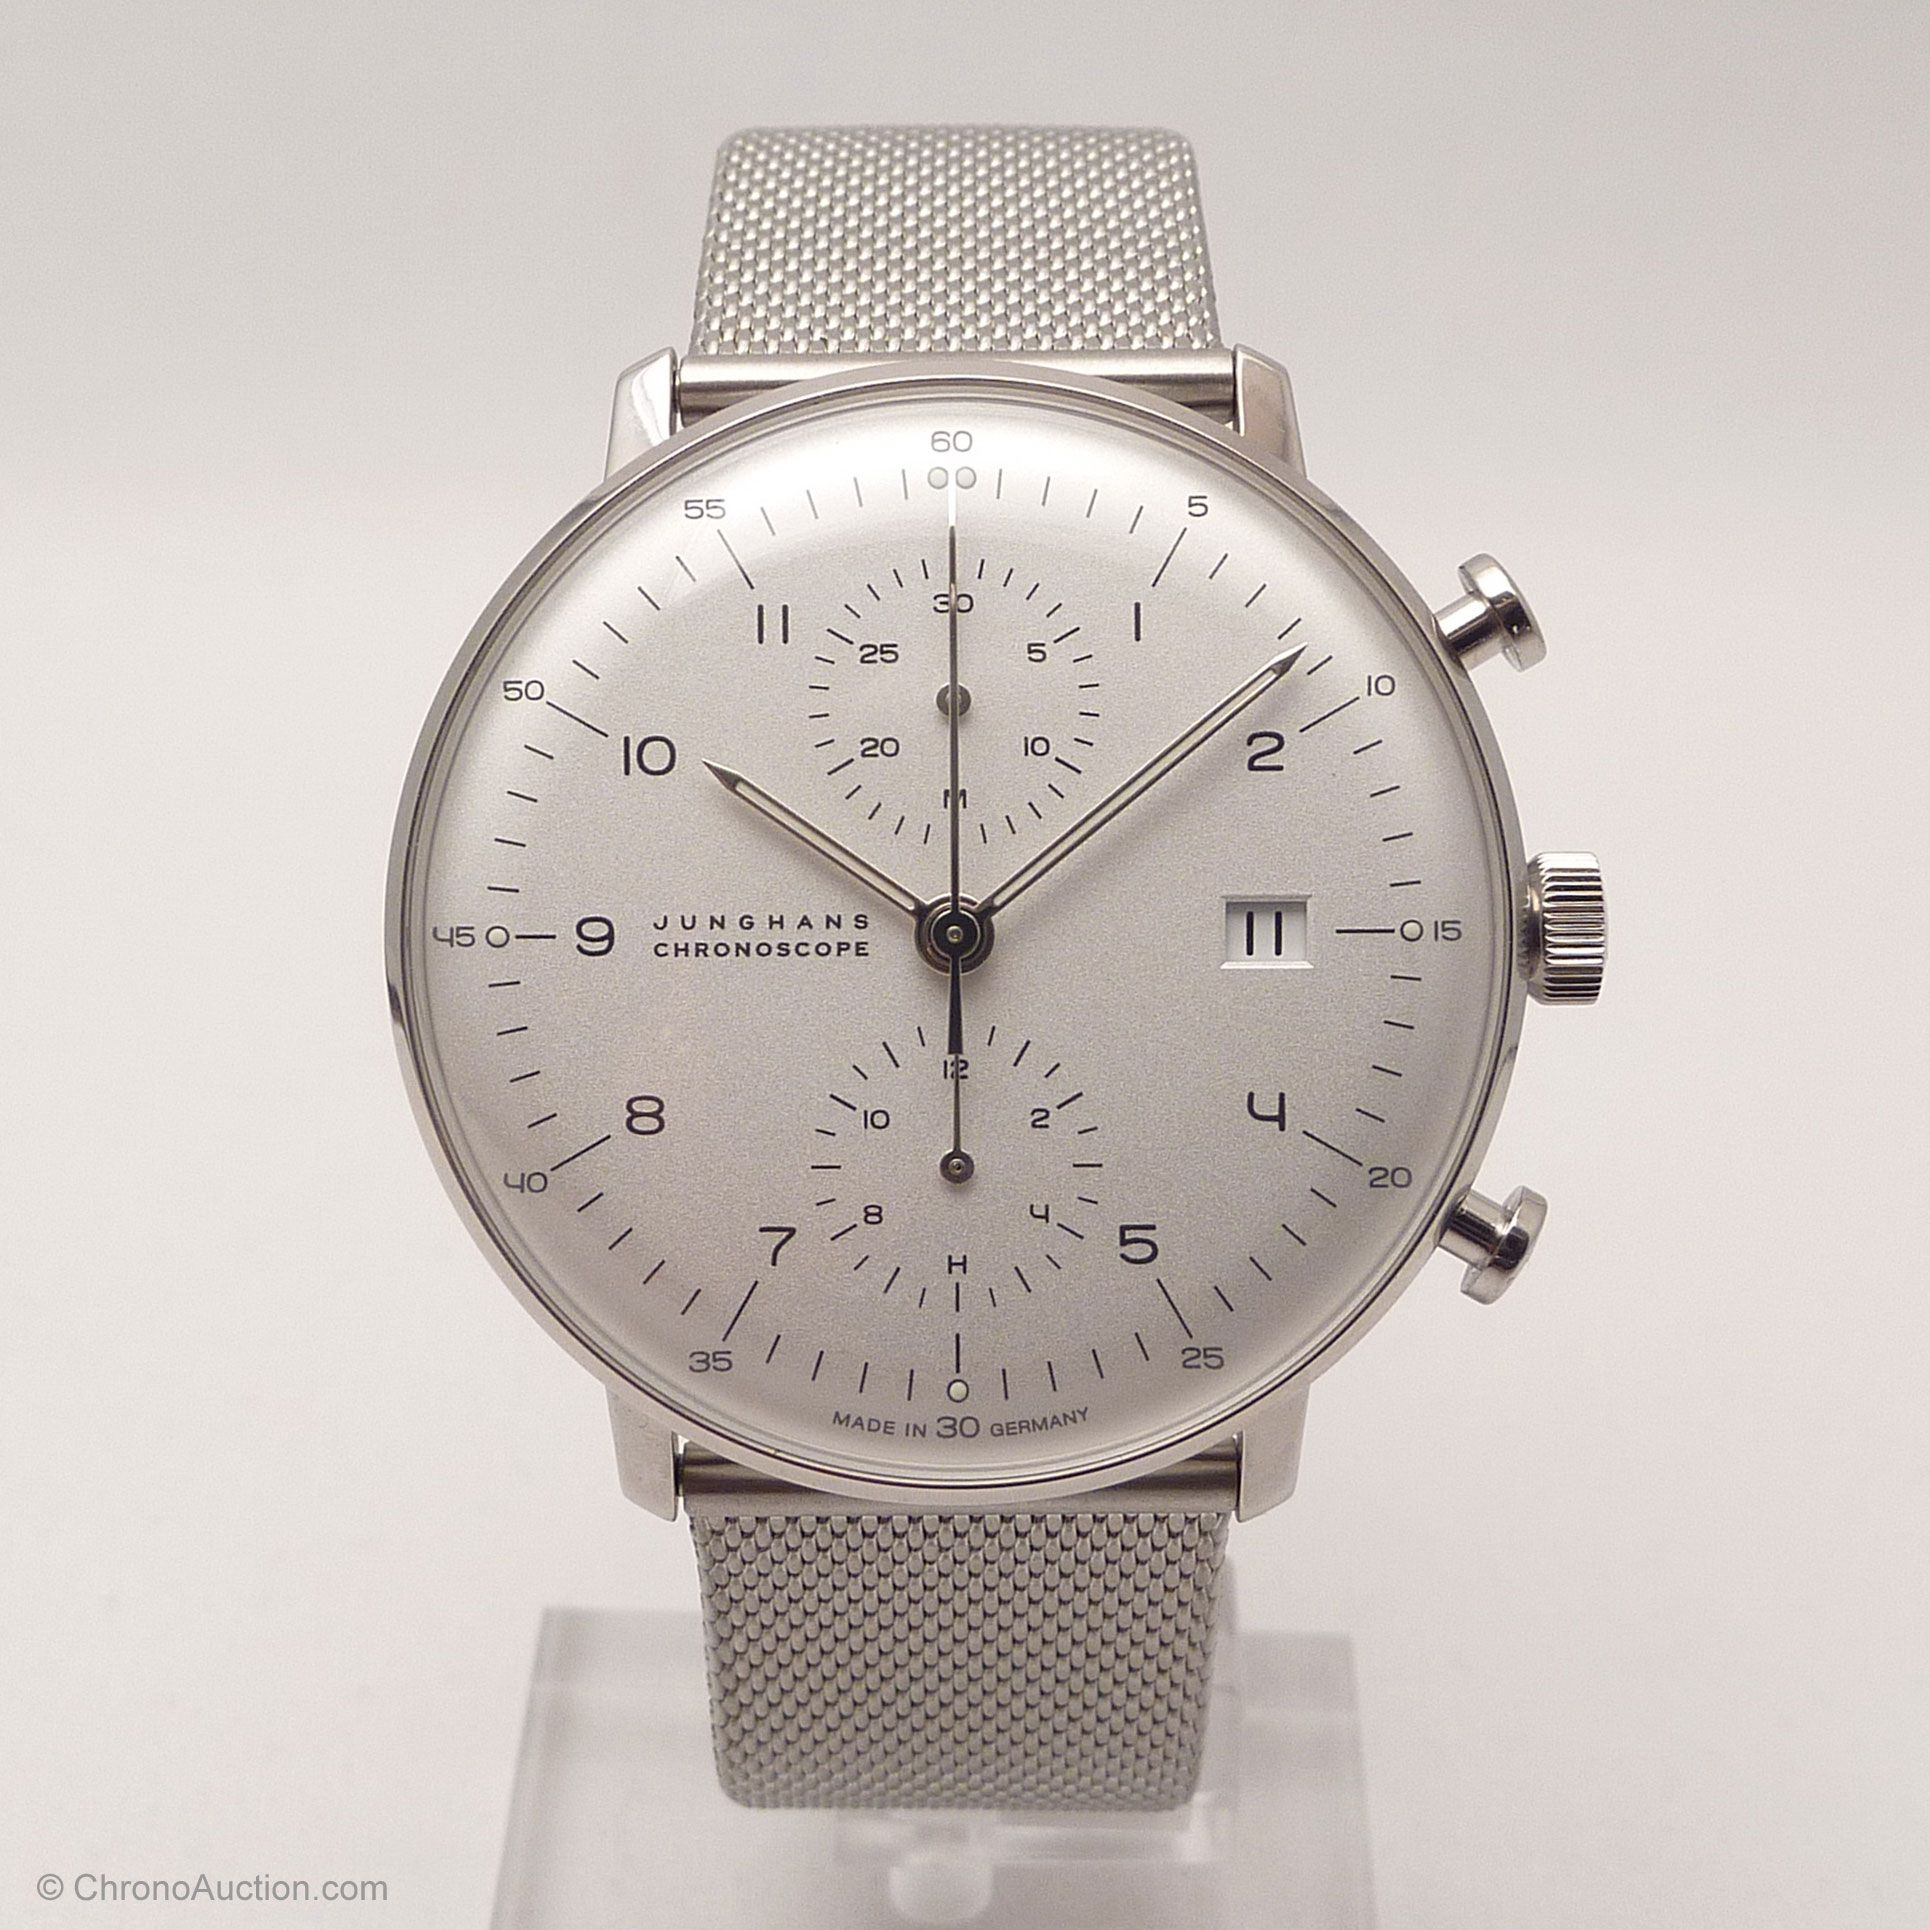 Junghans Uhr Referenz 027 4003 44 Max Bill Chronoscope Chronograph